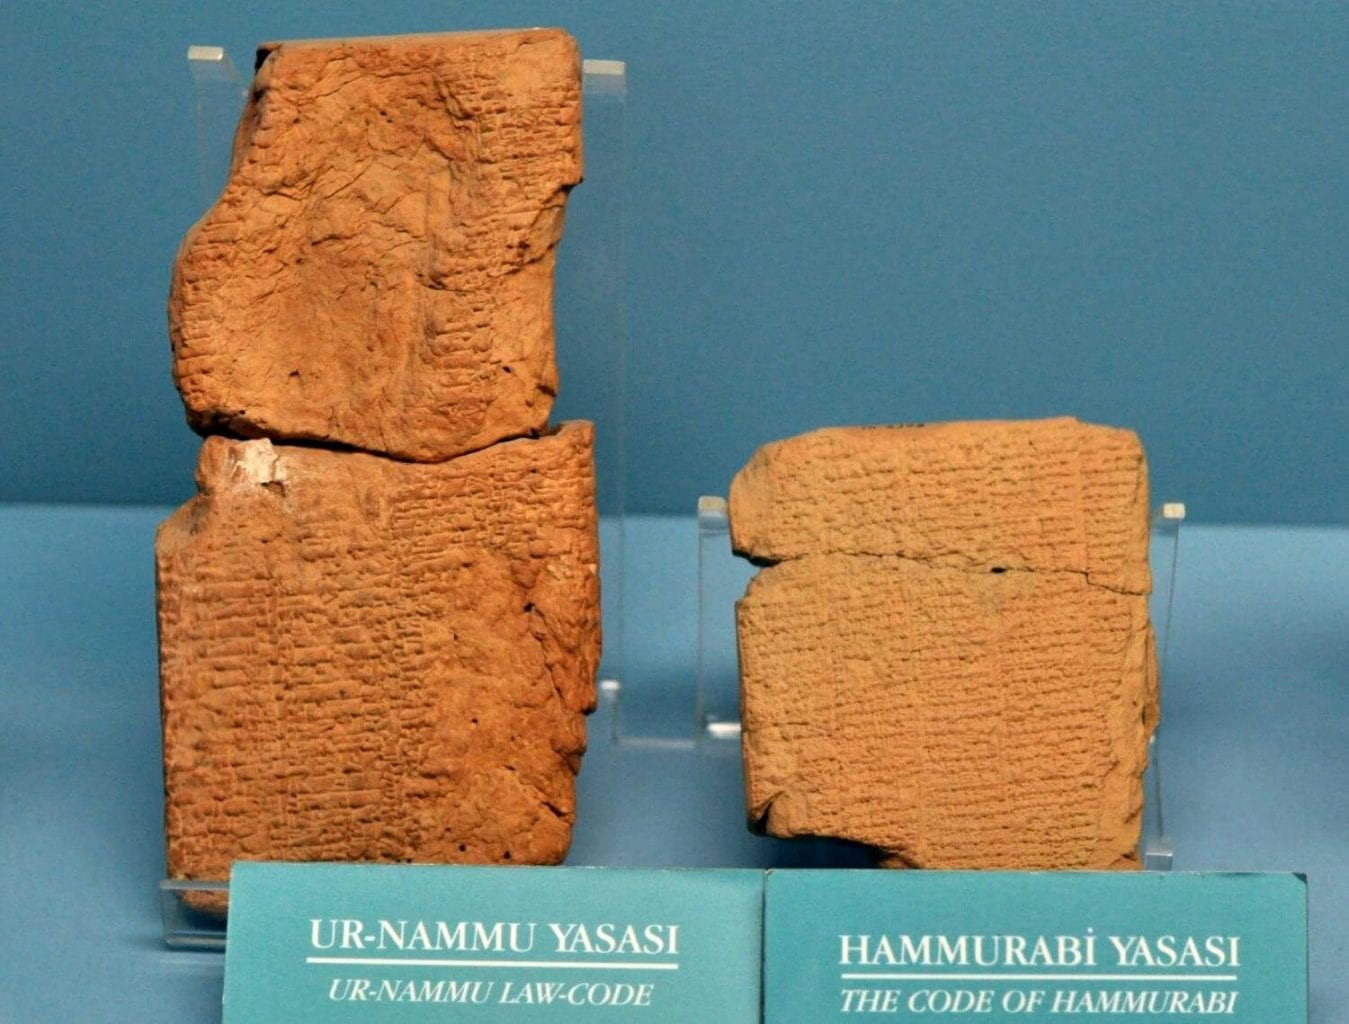 The Ur-Nammu law code and the Code of Hammurabi. Credit: TurkishArchaeoNews